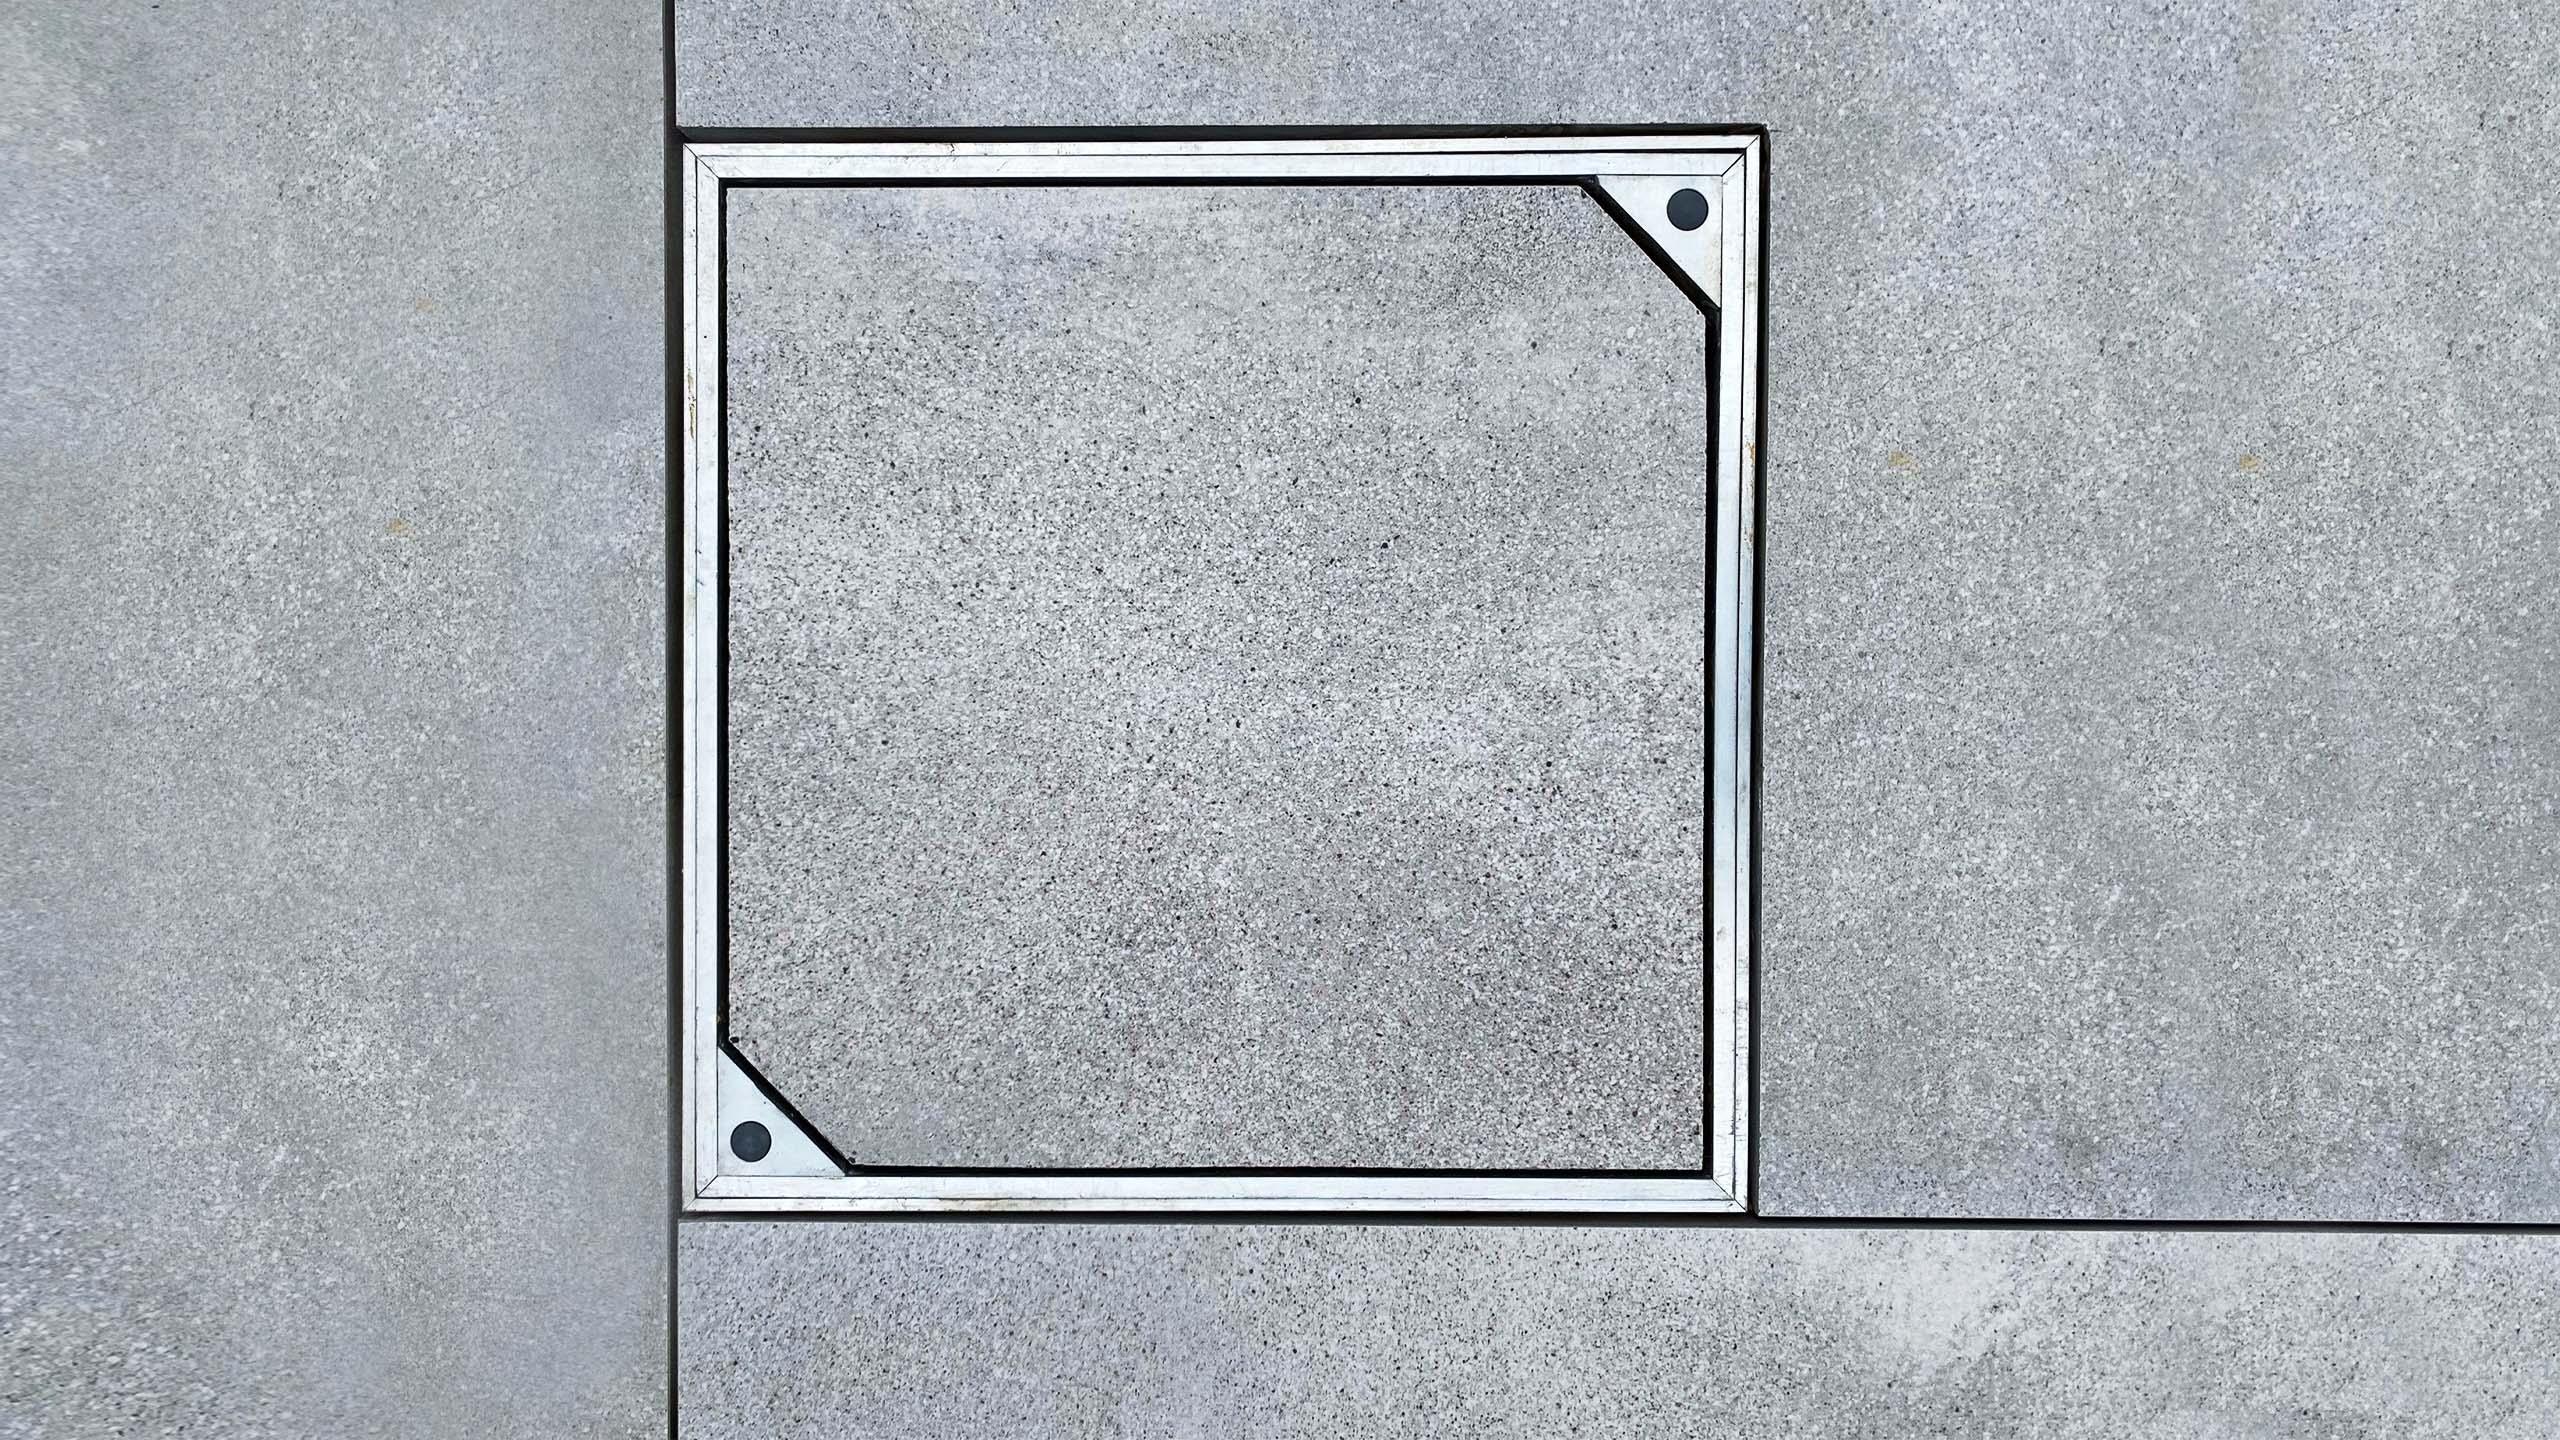 Aluminium Triple Sealed Small Square Manhole Cover With Slab Floor